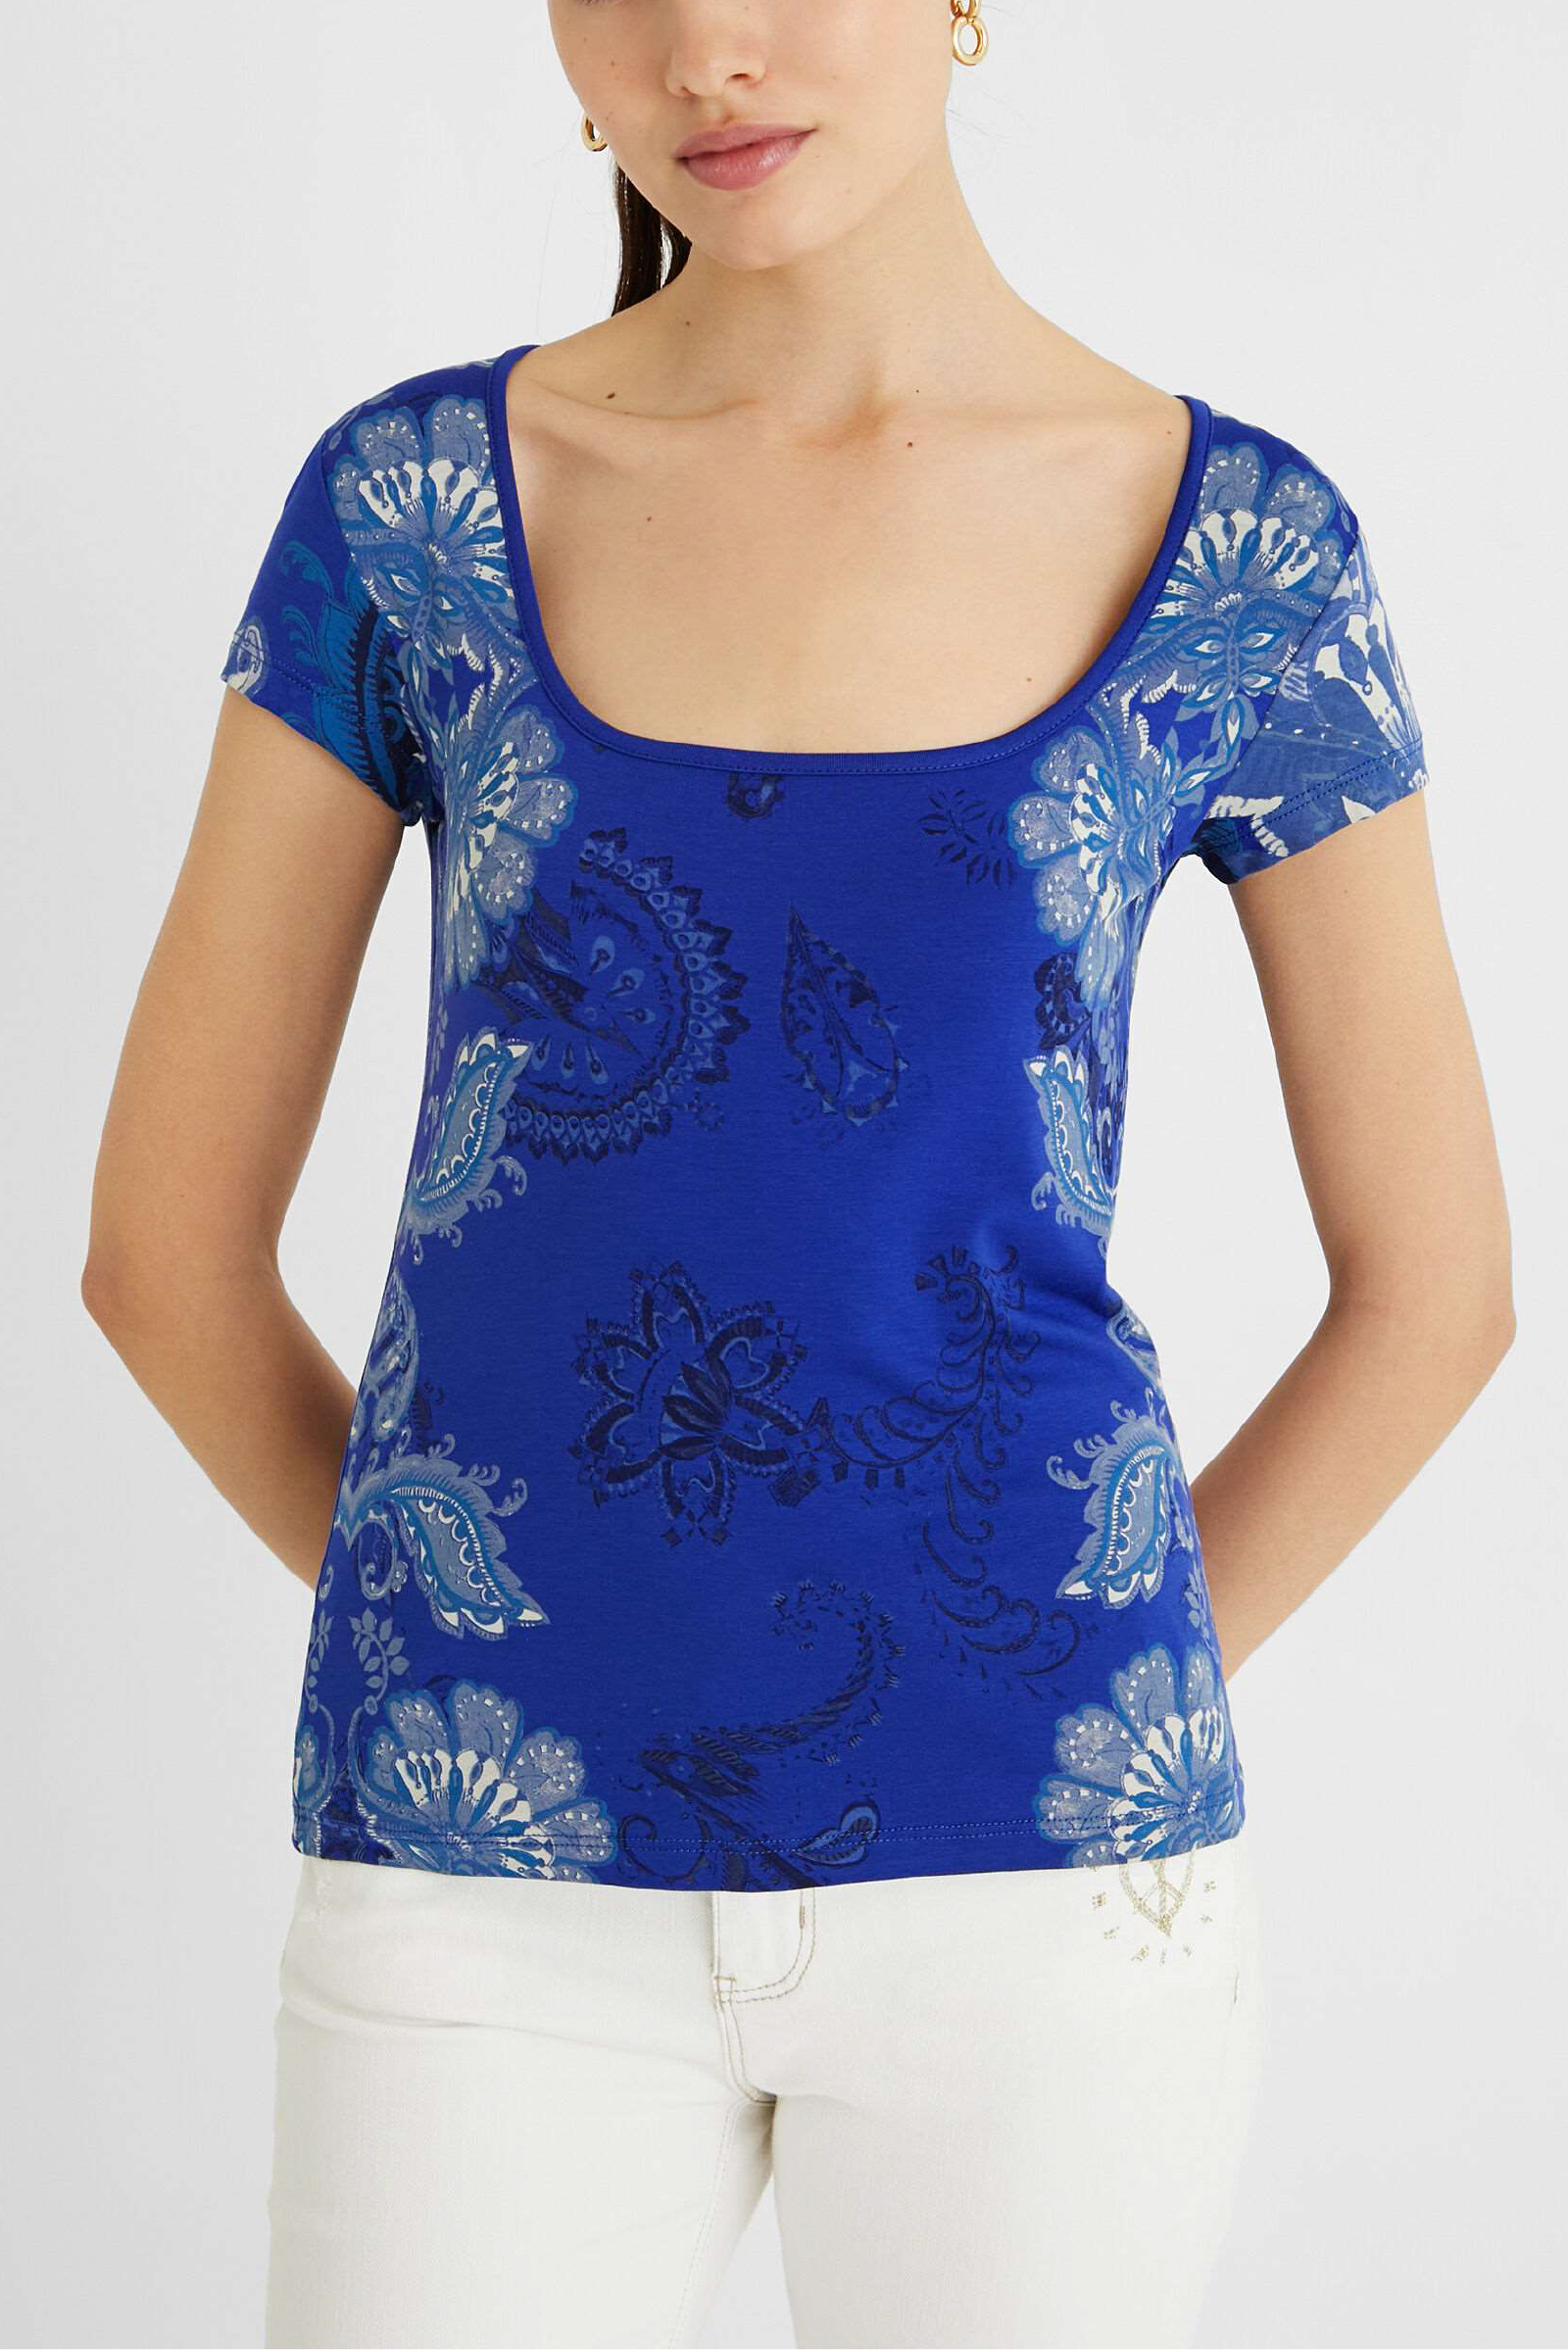 T-Shirt Modello BRASILIA DESIGUAL | T-Shirt | 21SWTKD85000